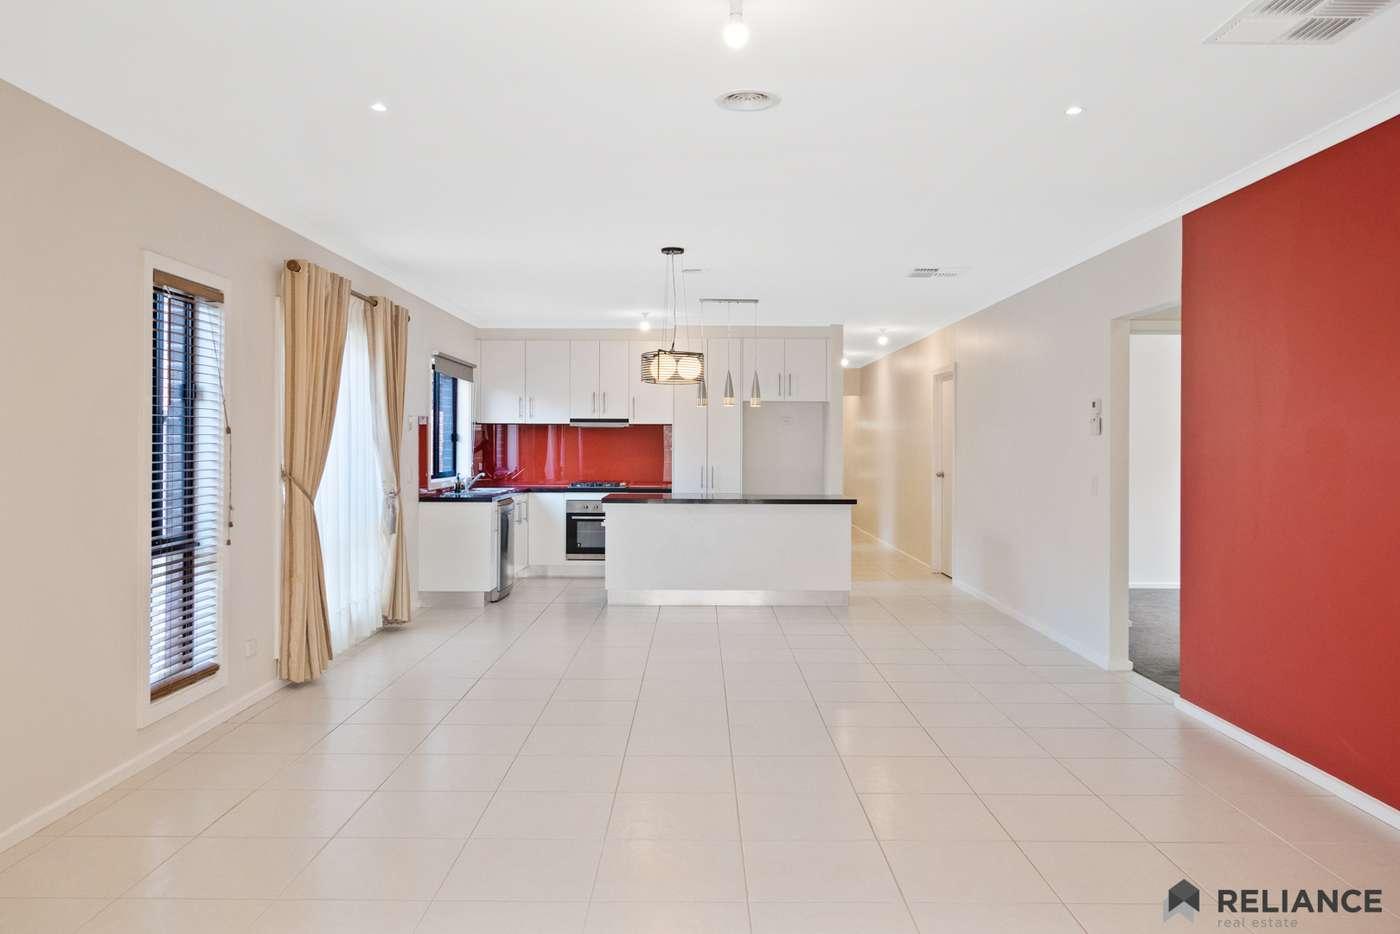 Fifth view of Homely house listing, 14 Montezuma Avenue, Truganina VIC 3029